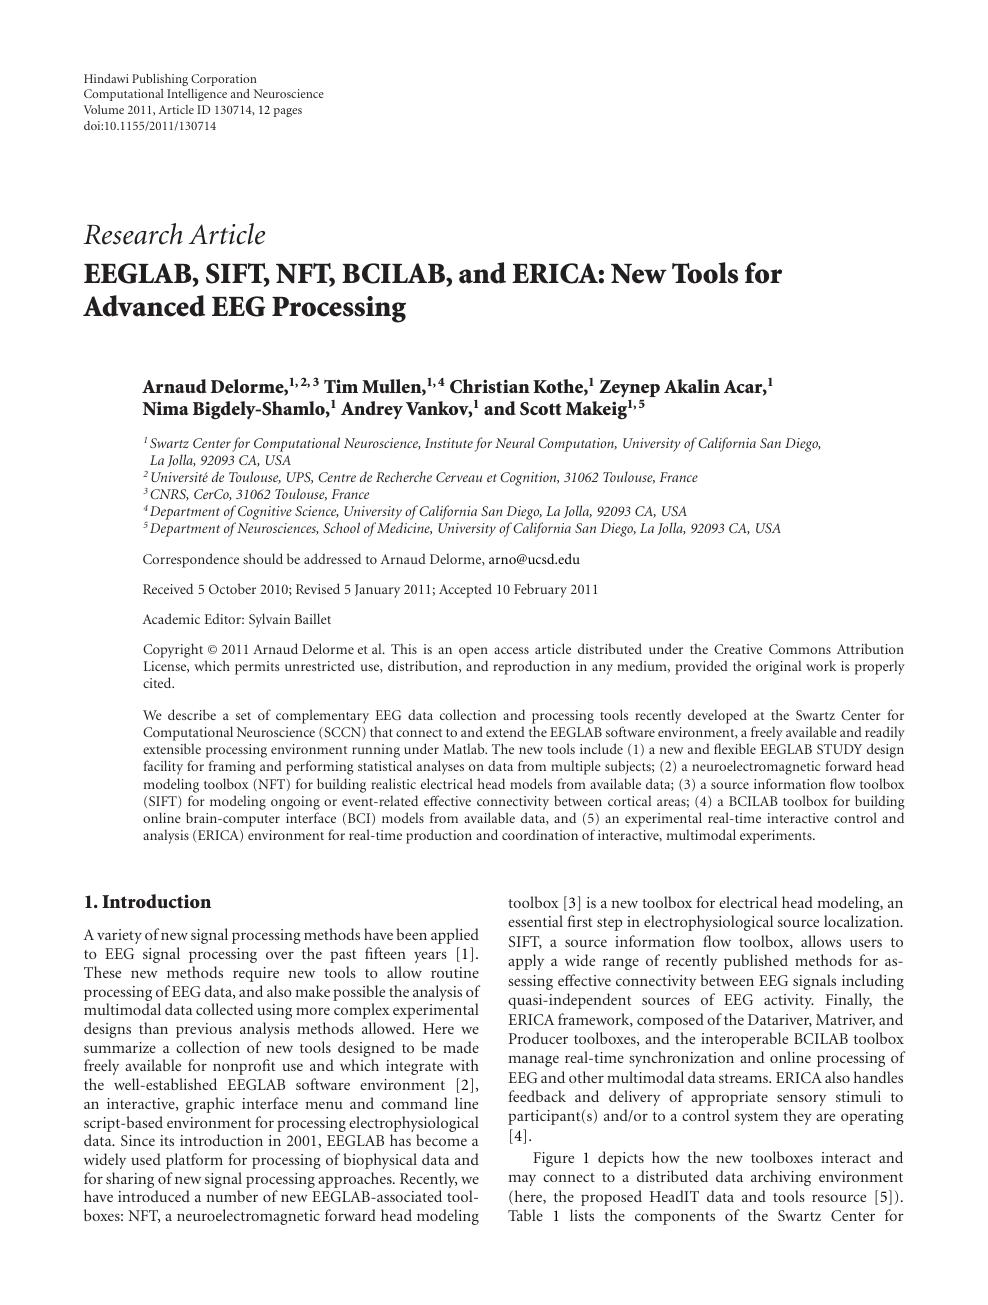 EEGLAB, SIFT, NFT, BCILAB, and ERICA: New Tools for Advanced EEG